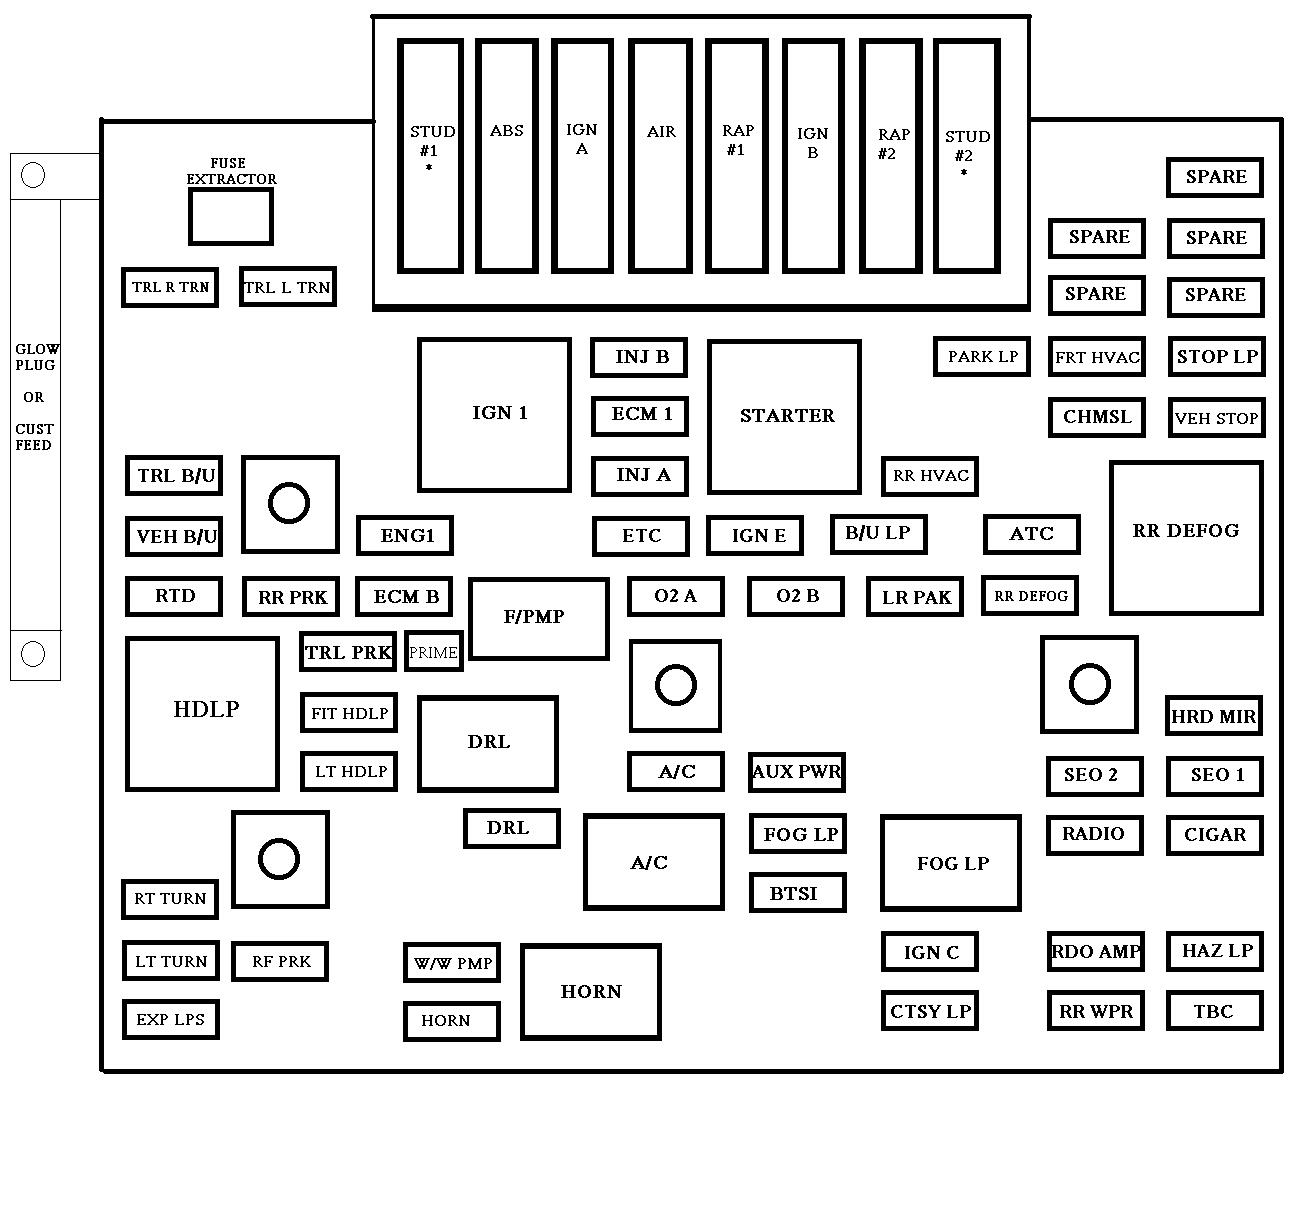 2002 Chevy Silverado Z71 Fuse Diagram Wiring Diagram Brain Cable C Brain Cable C Piuconzero It